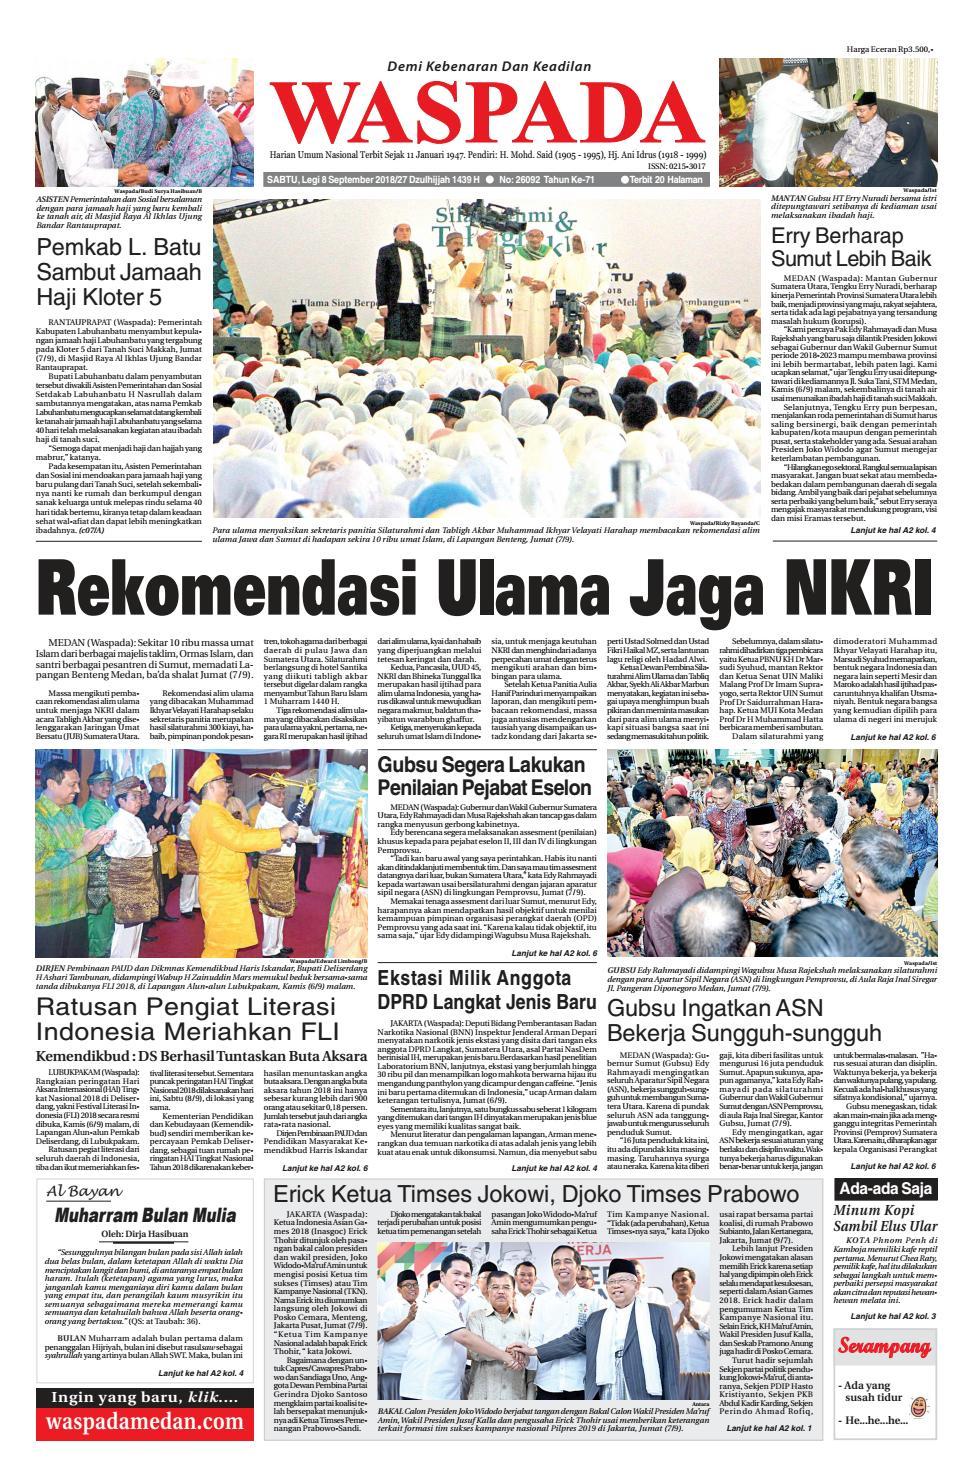 Waspada Sabtu 8 September 2018 By Harian Issuu Kopibubuk Robusta Toko Rezeki Akumandiri Malang